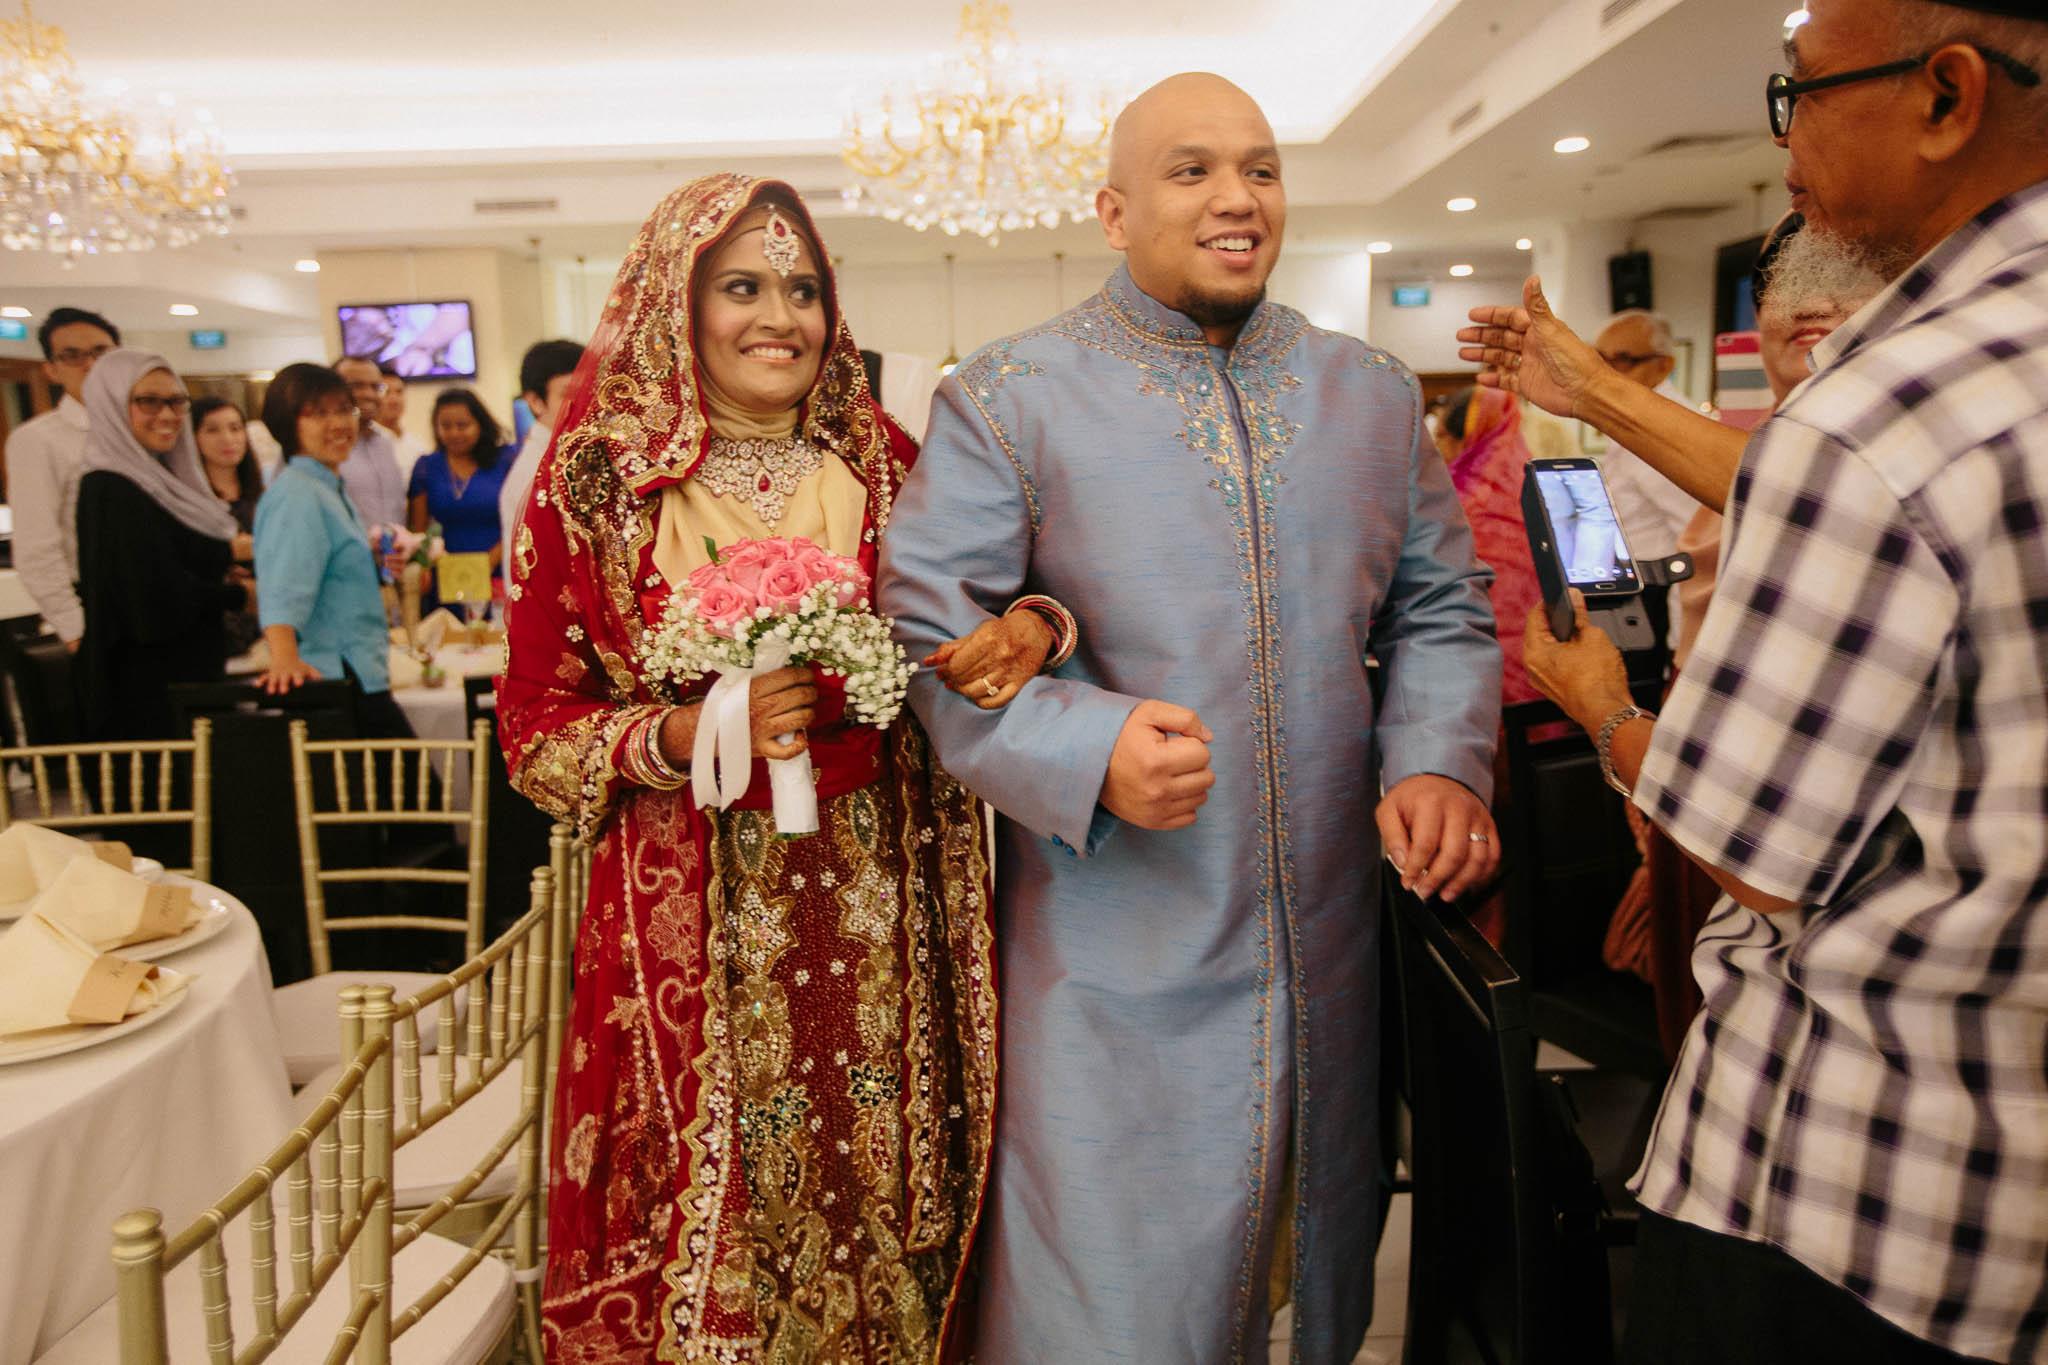 singapore-wedding-photographer-malay-indian-pre-wedding-travel-wmt-2015-shereen-farid-53.jpg